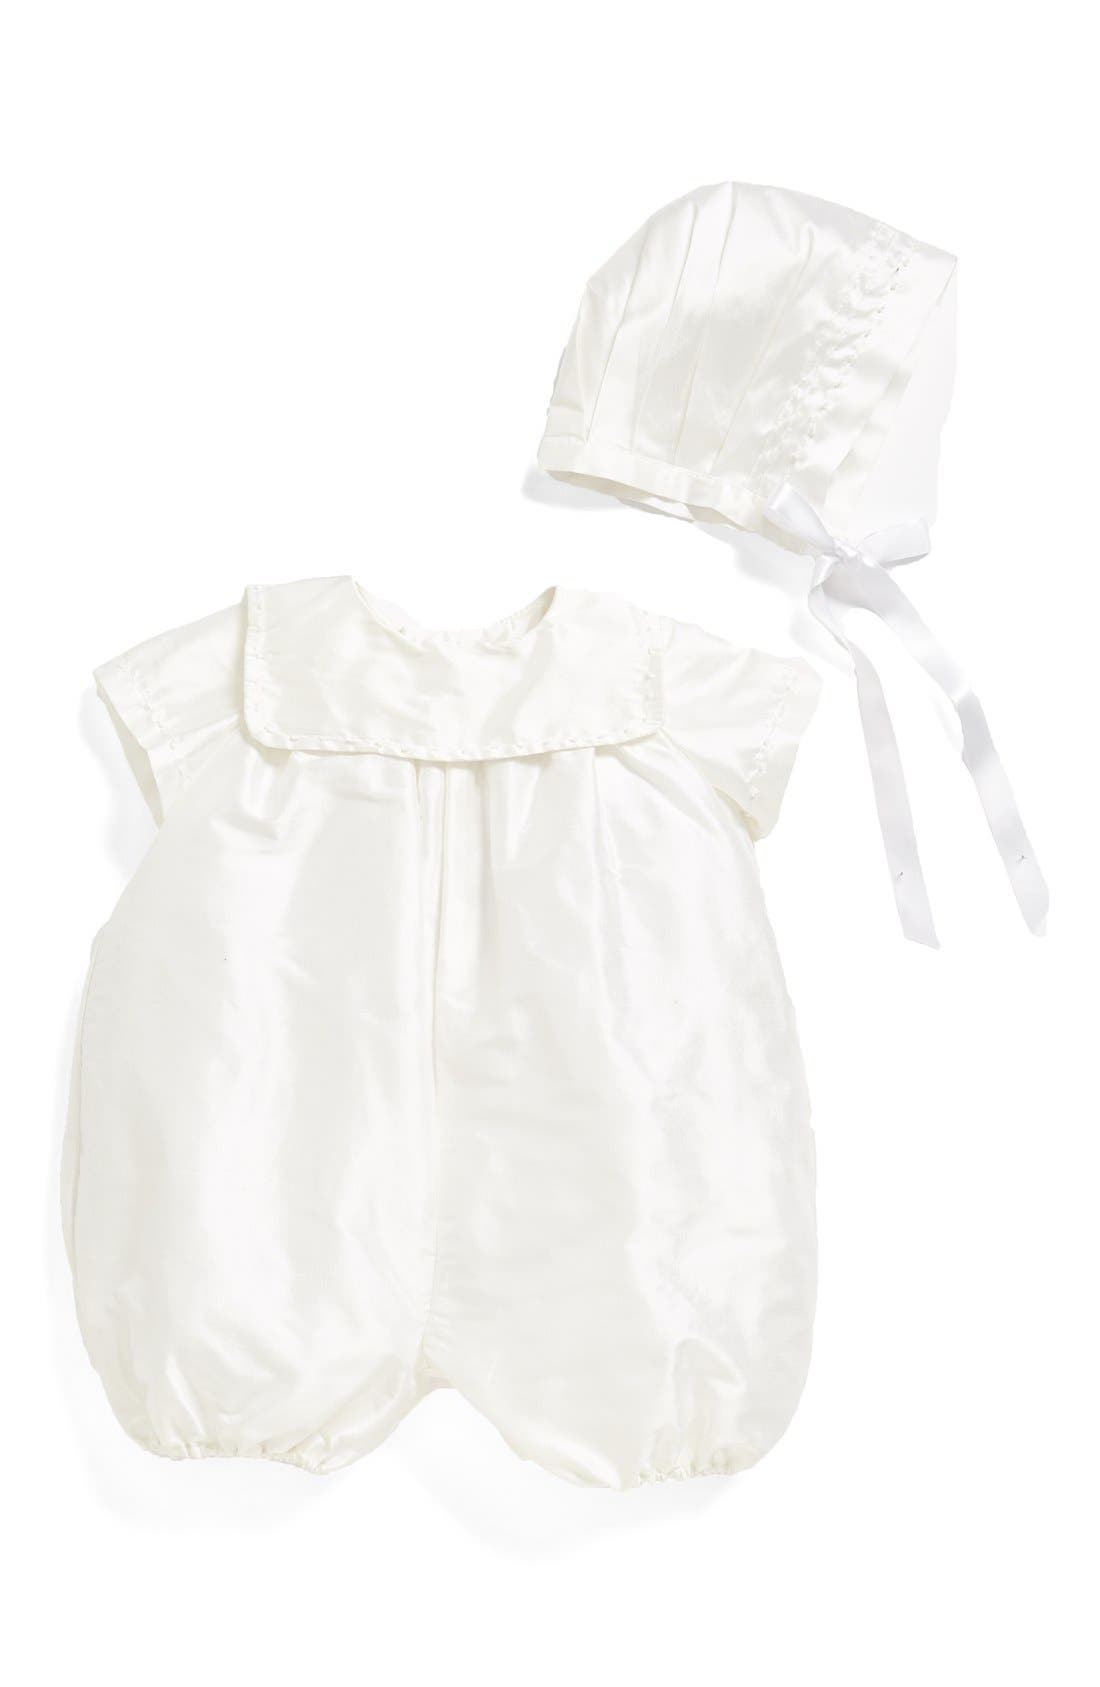 Isabel Garreton 'Charming' Silk Romper & Bonnet (Baby)